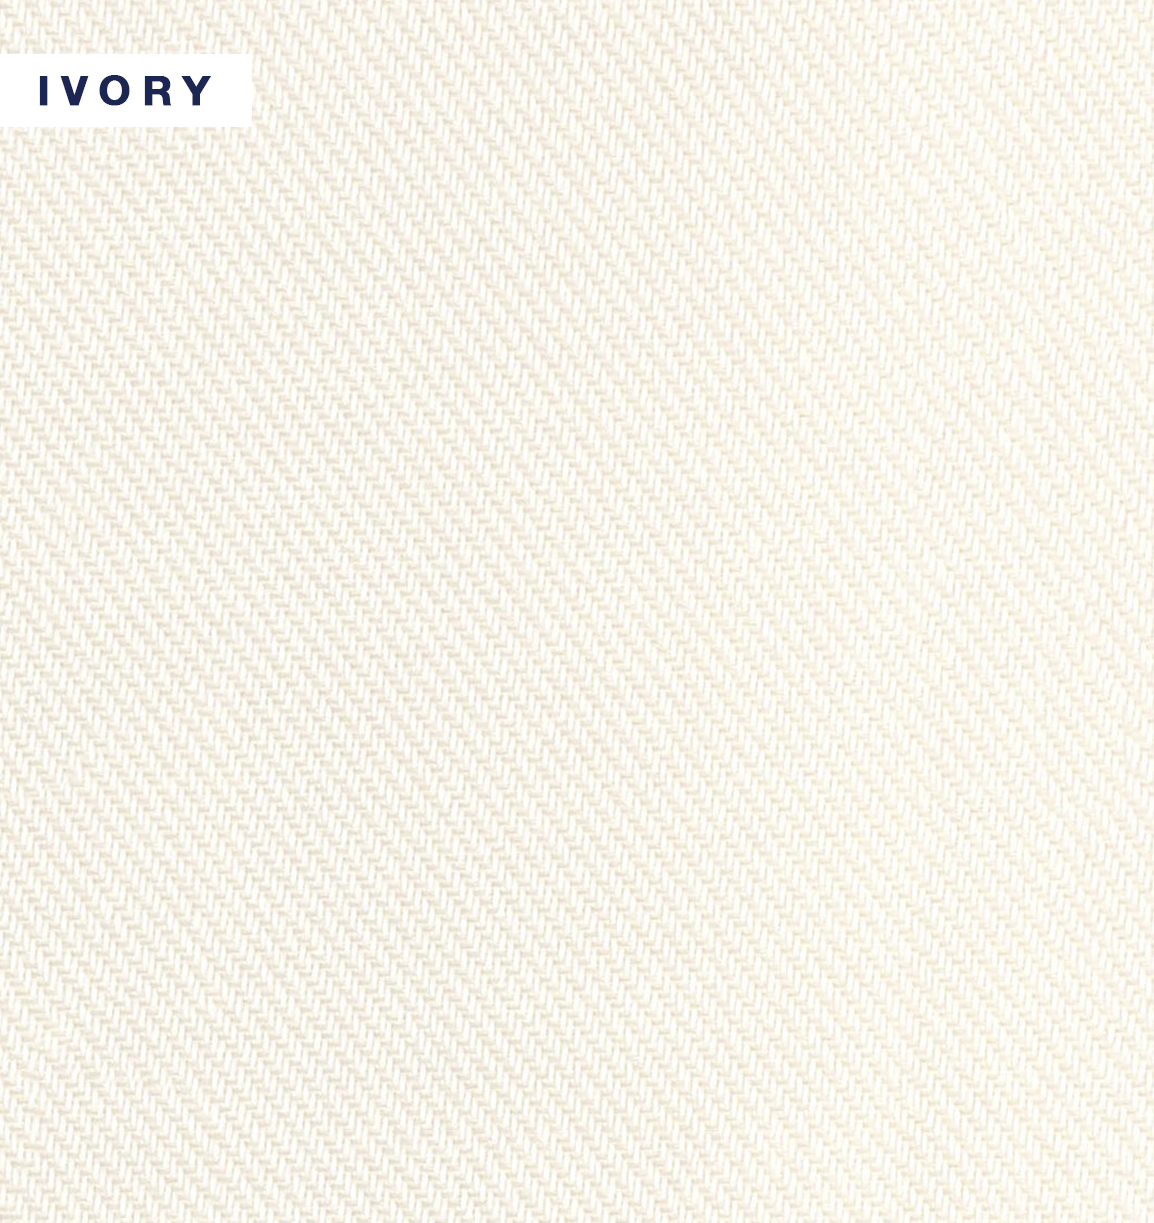 Aquila - Ivory.jpg